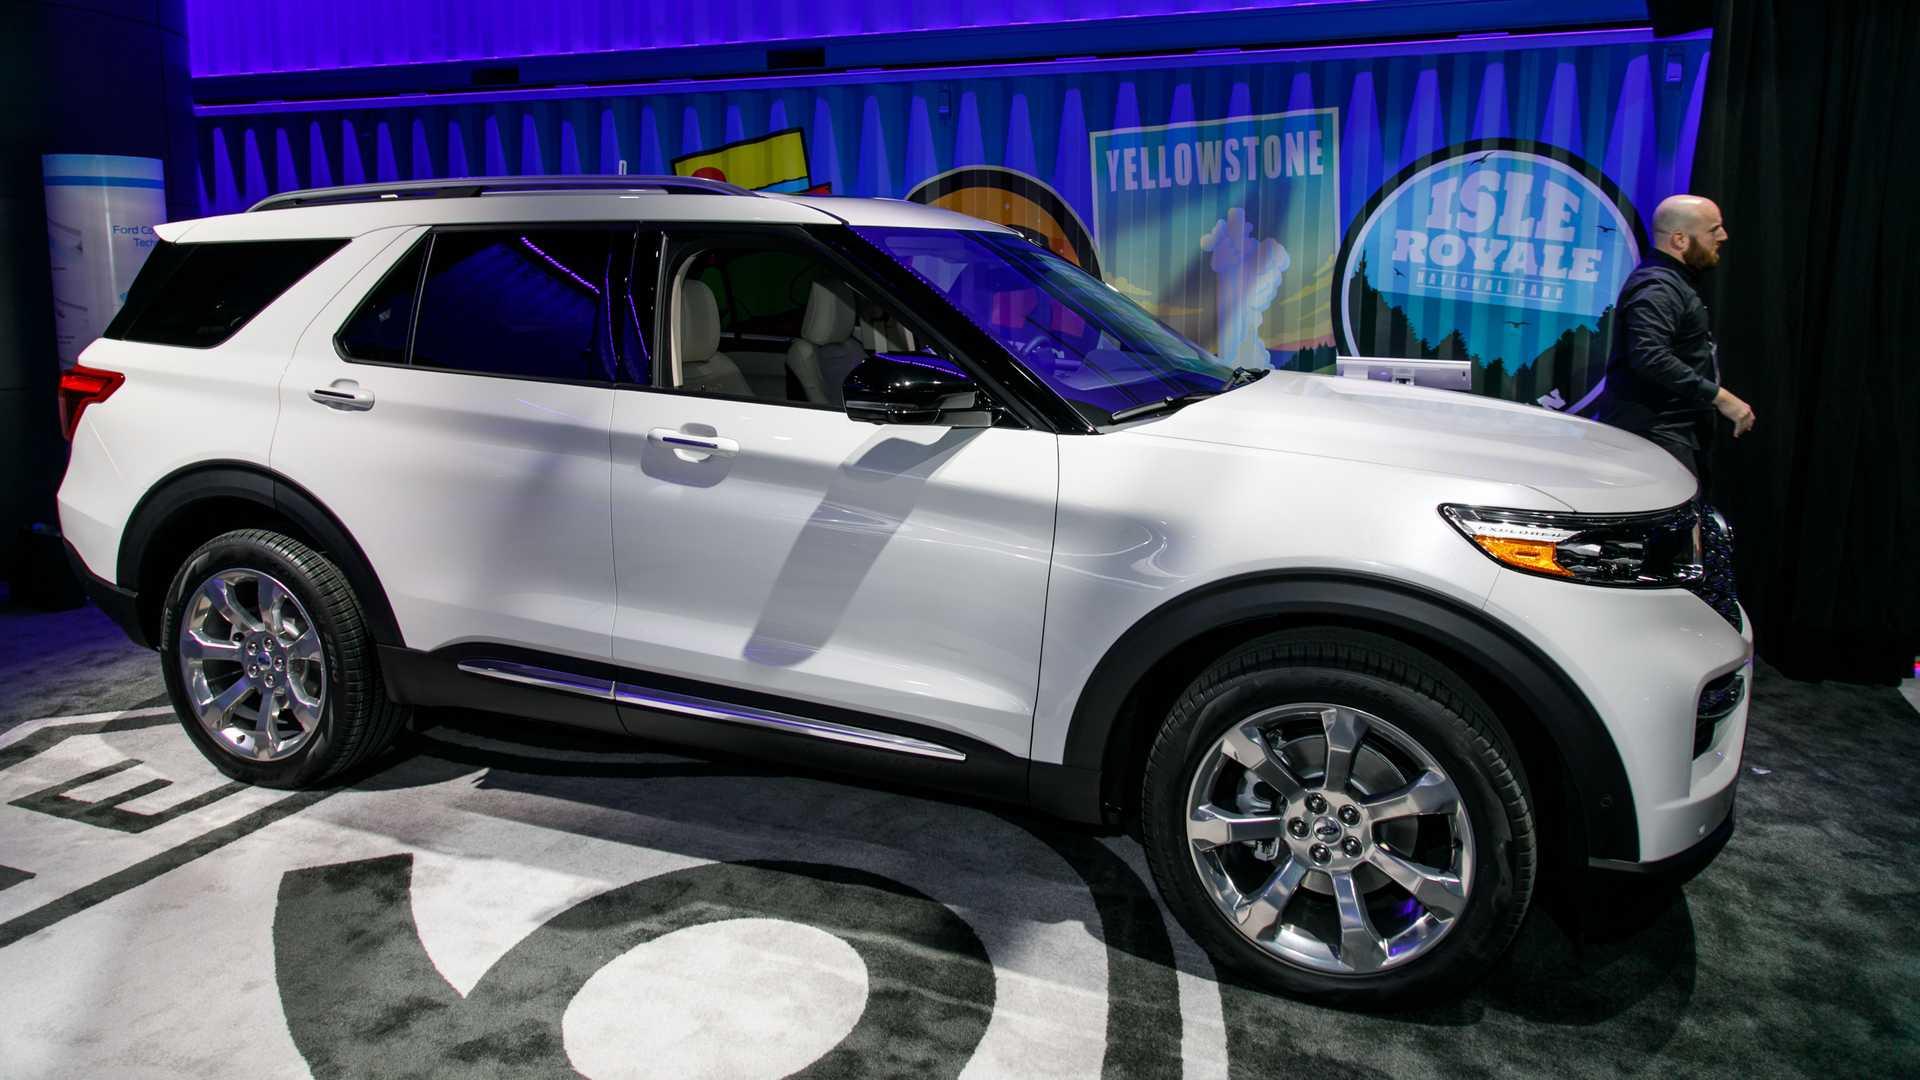 58 Best Review 2020 Ford Explorer Design New Review for 2020 Ford Explorer Design